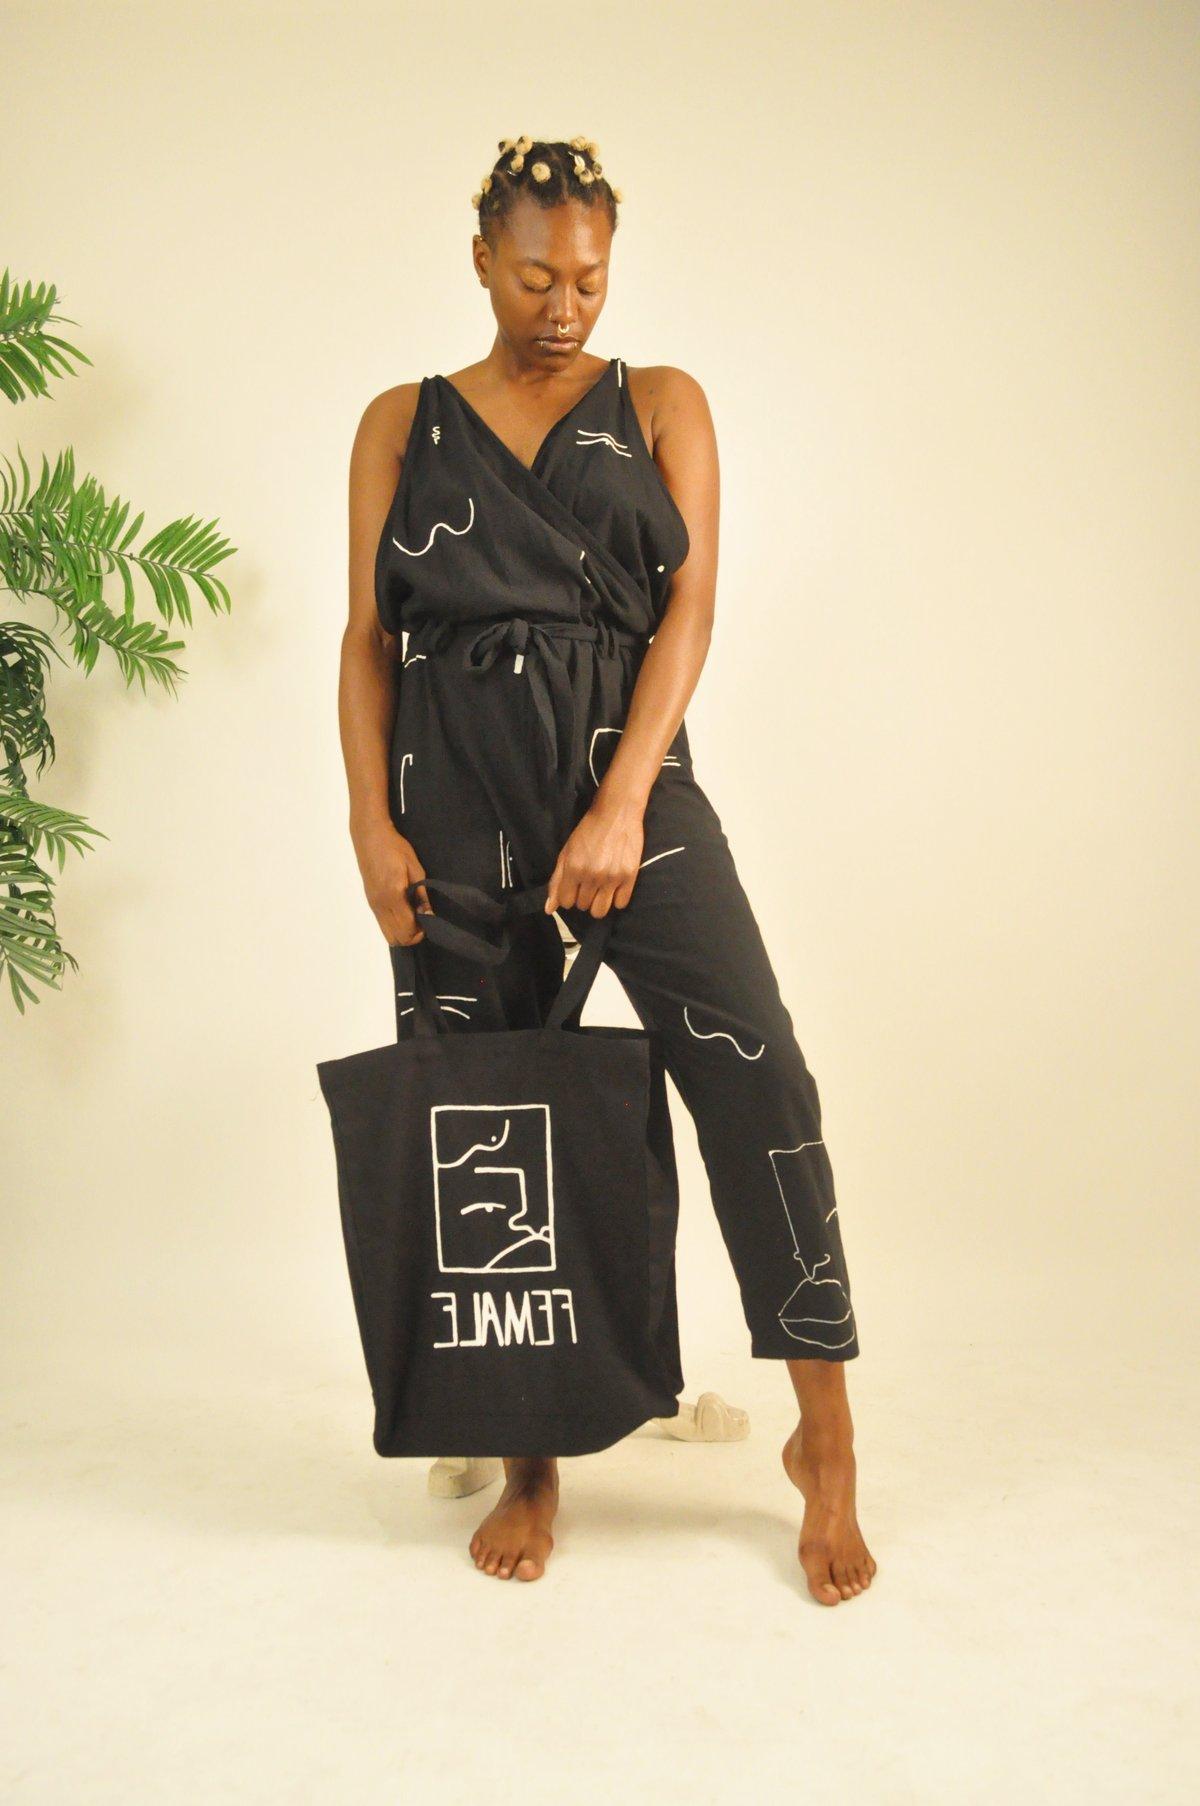 Image of female bag